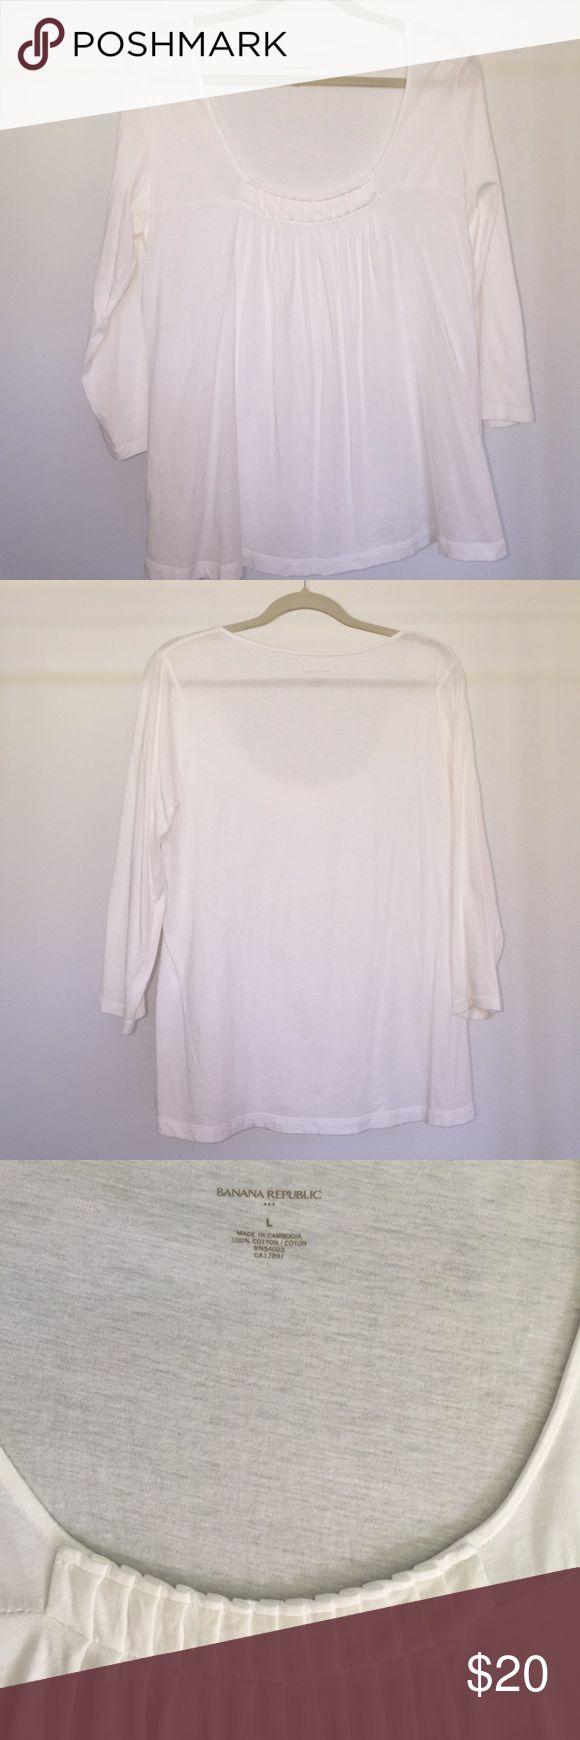 Banana Republic white quarter sleeve tshirt Banana Republic white quarter sleeve tshirt. Very comfortable! Banana Republic Tops Tees - Long Sleeve